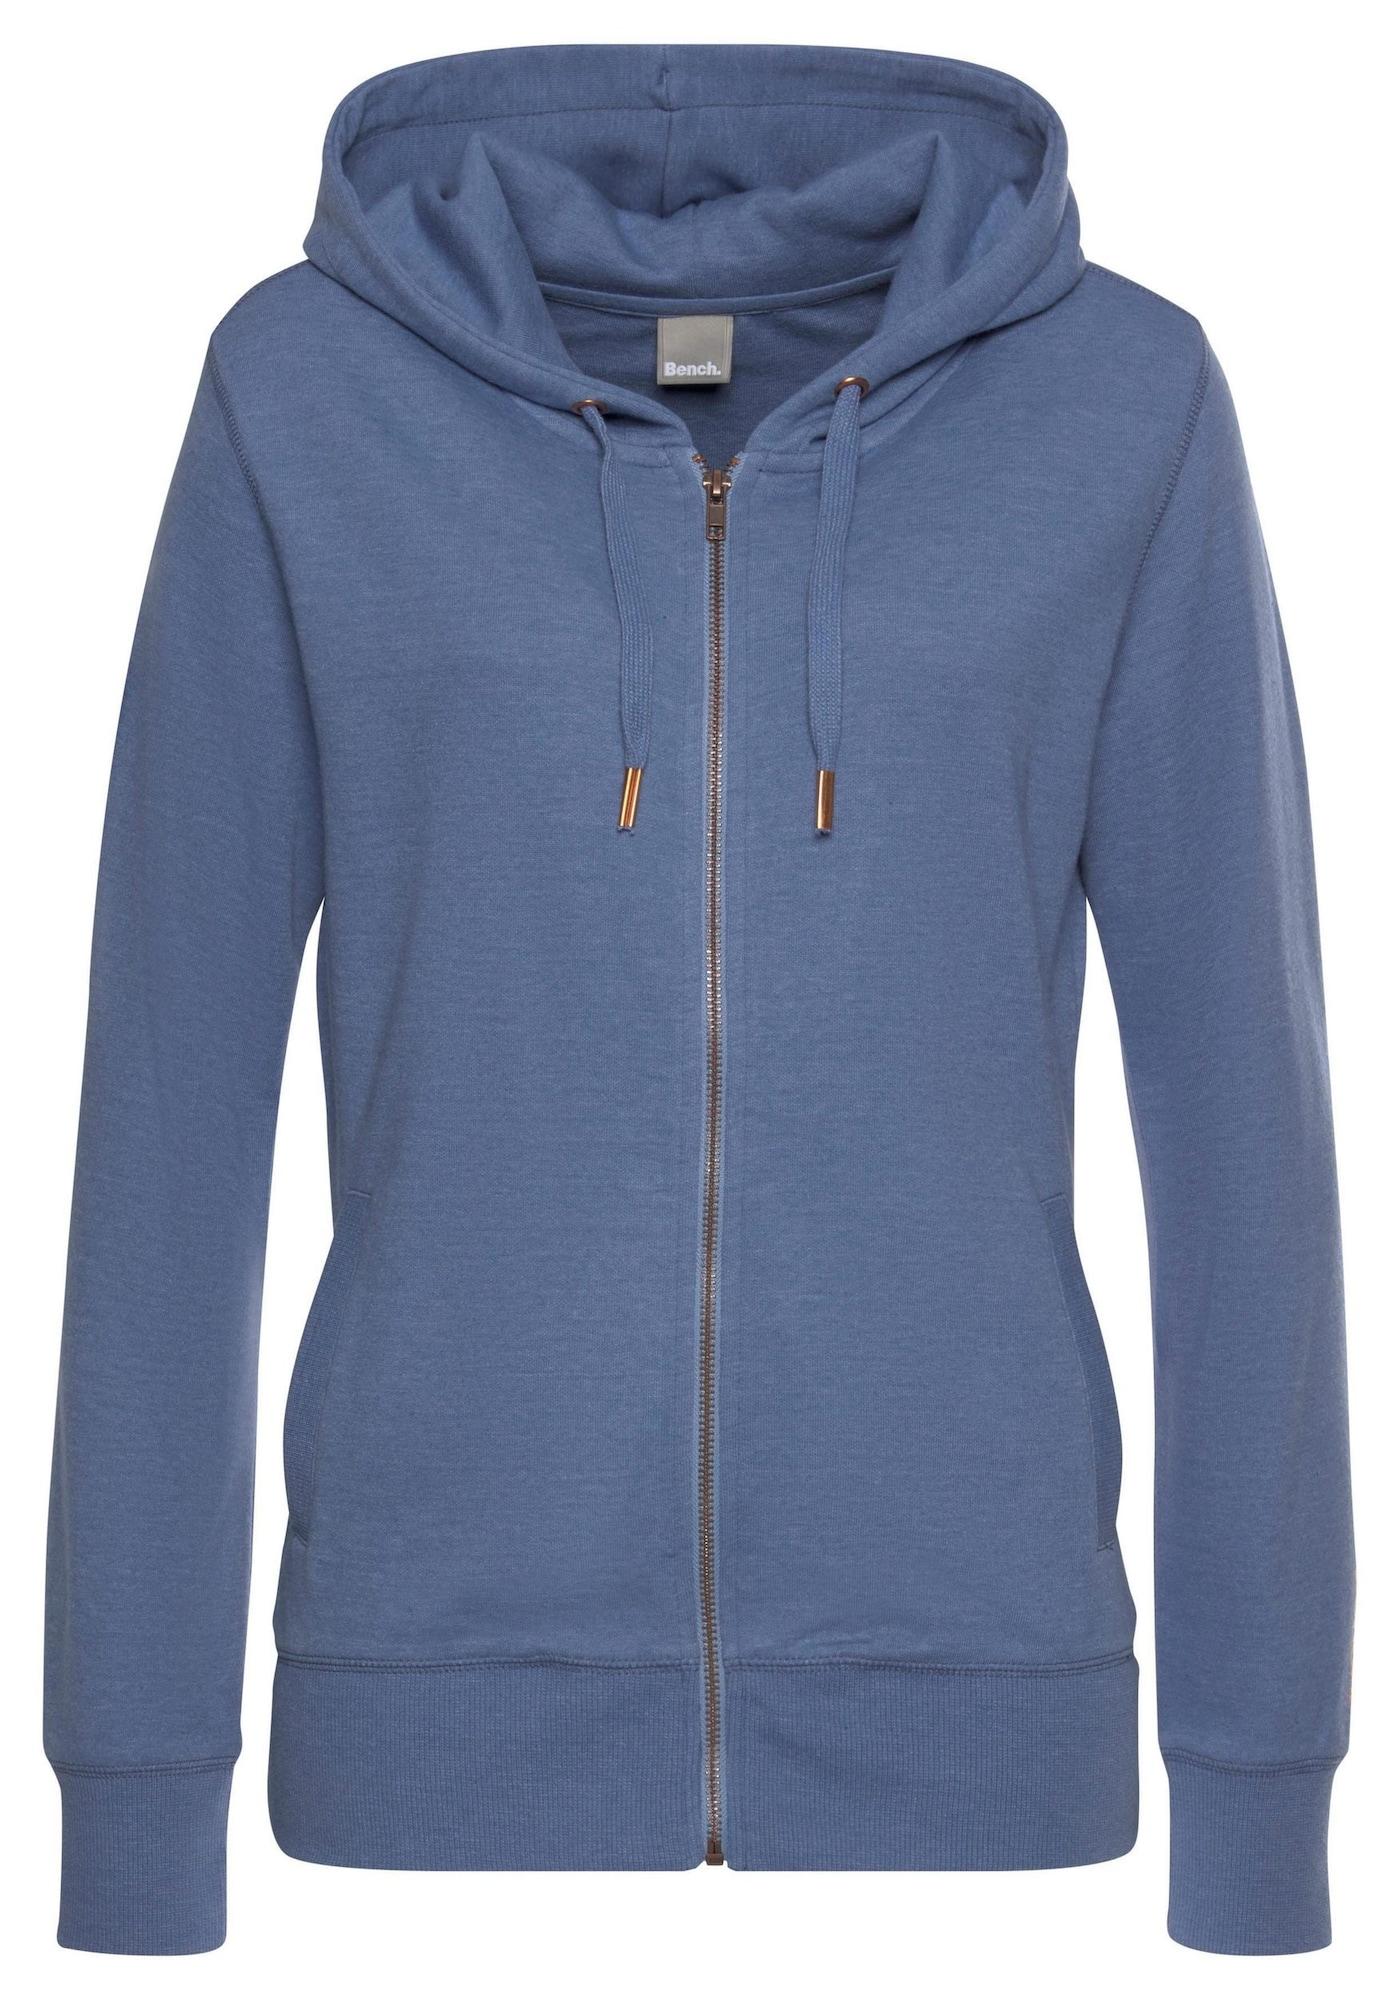 BENCH Džemperis tamsiai (džinso) mėlyna